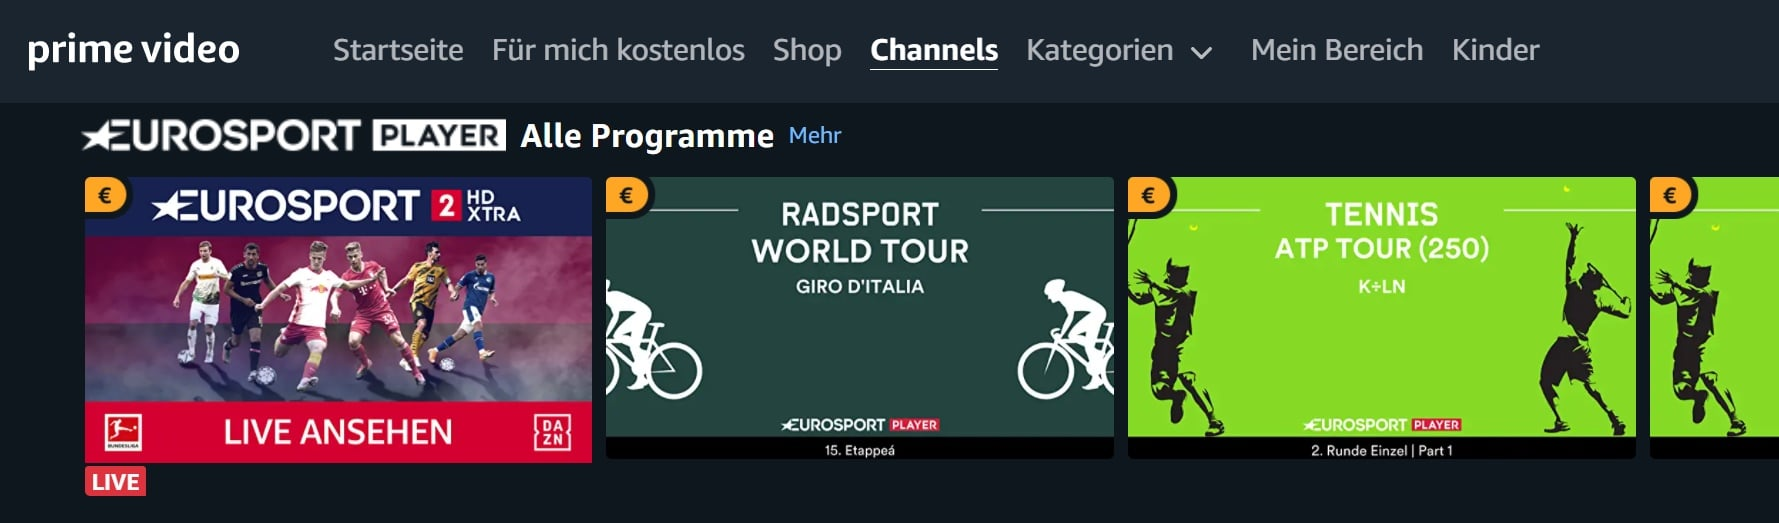 eurosport-player-angebote-prime-video